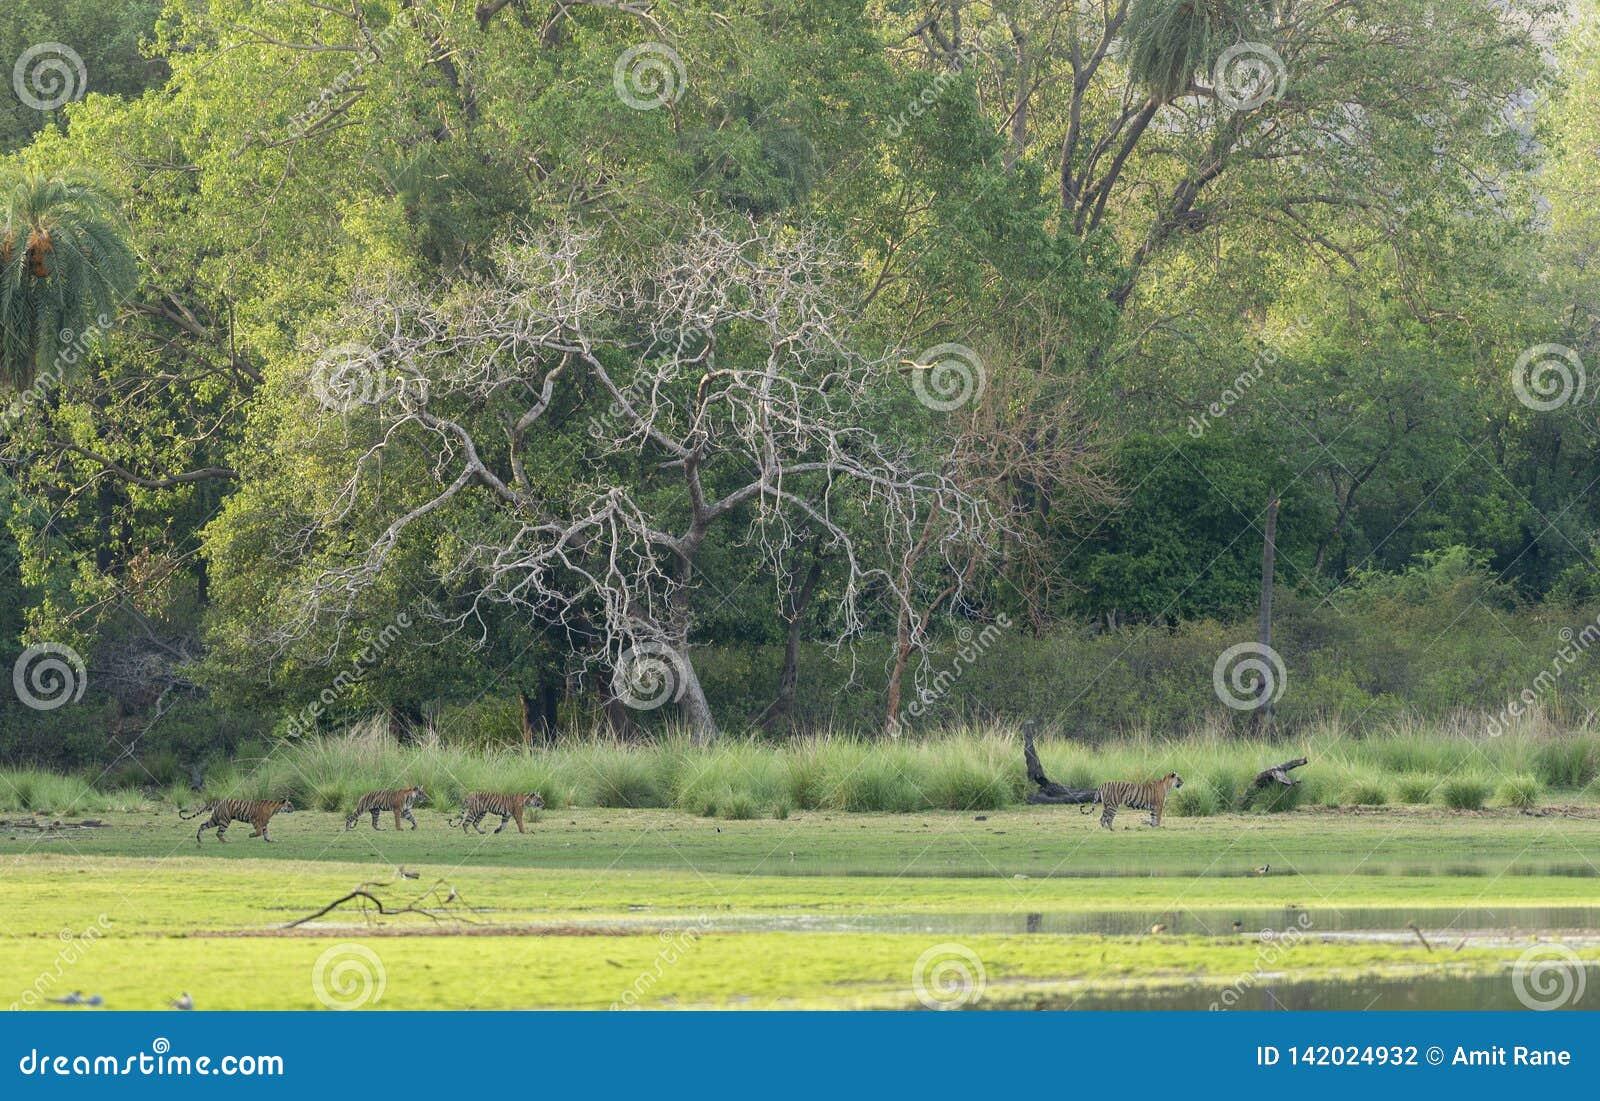 Quatro tigres que andam a luz inmorning no parque nacional de Ranthambhore